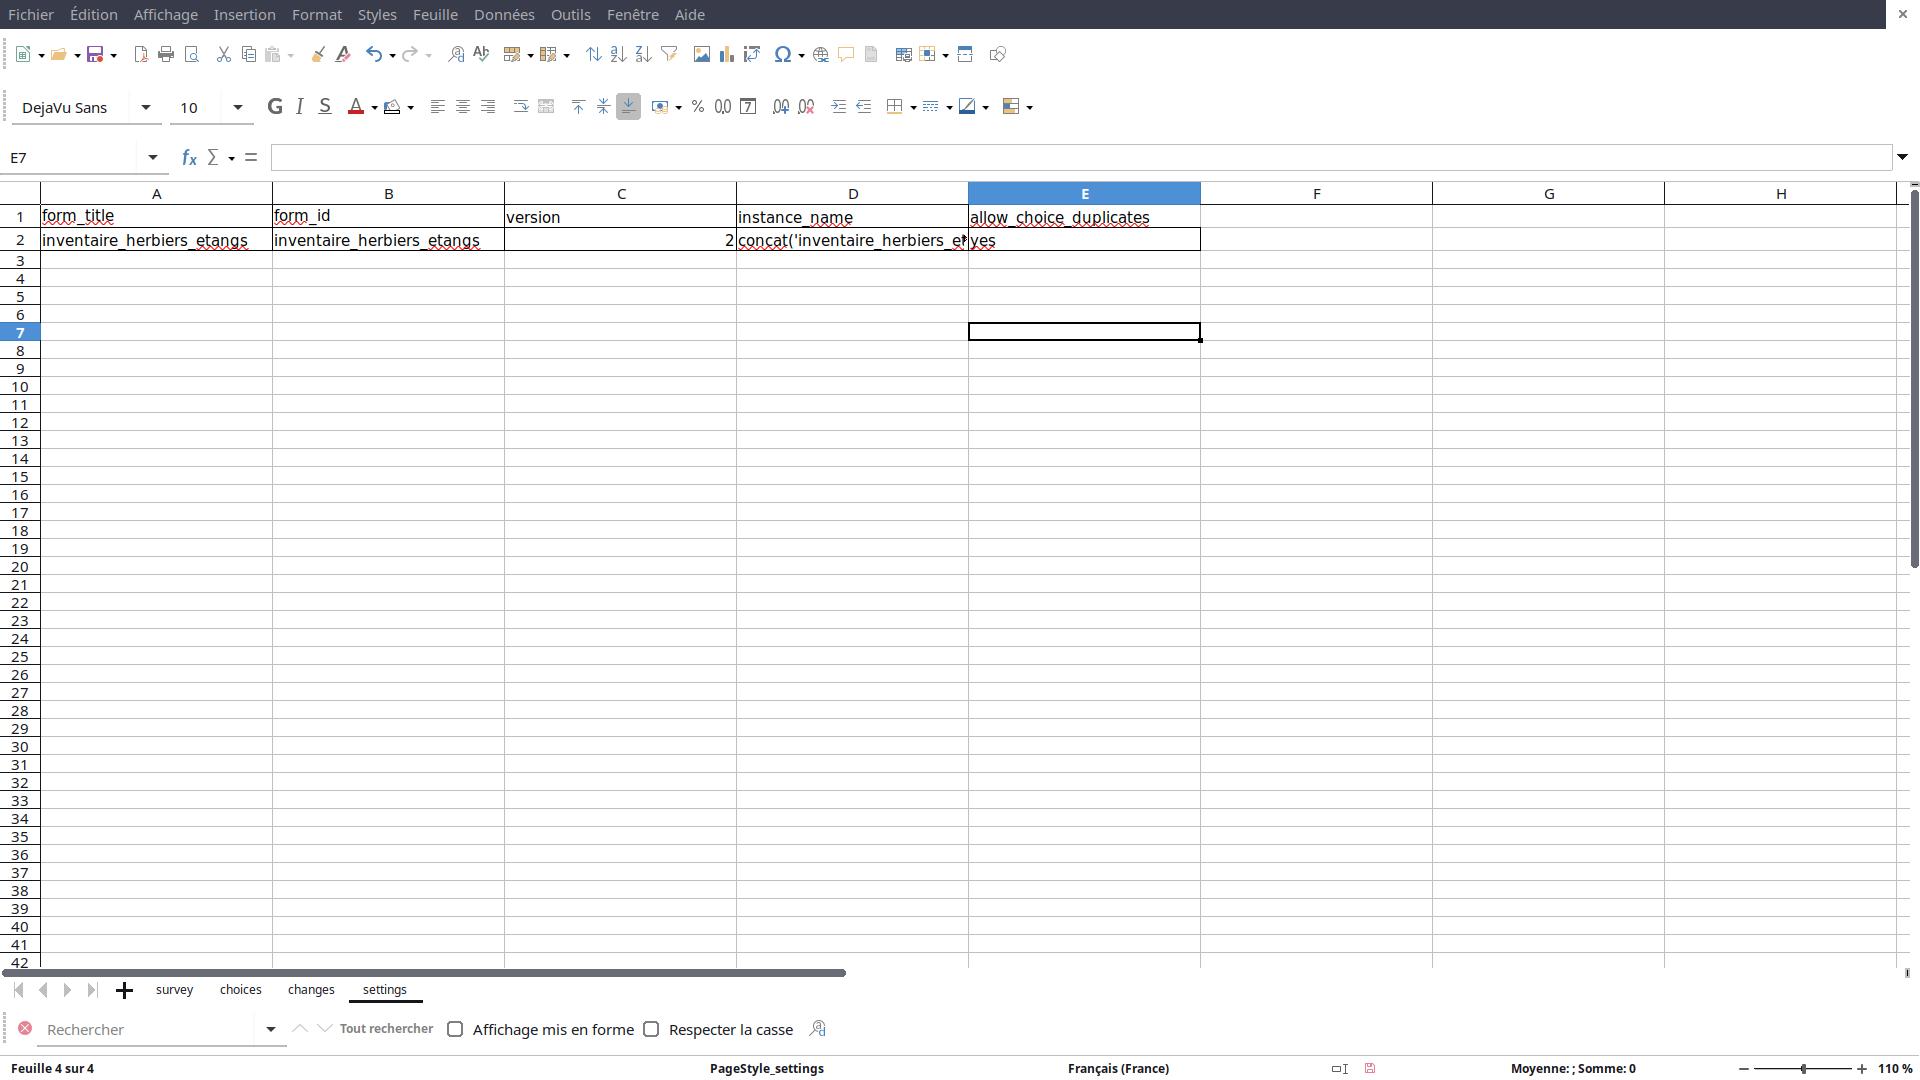 XLS-Form : feuille de calcul settings